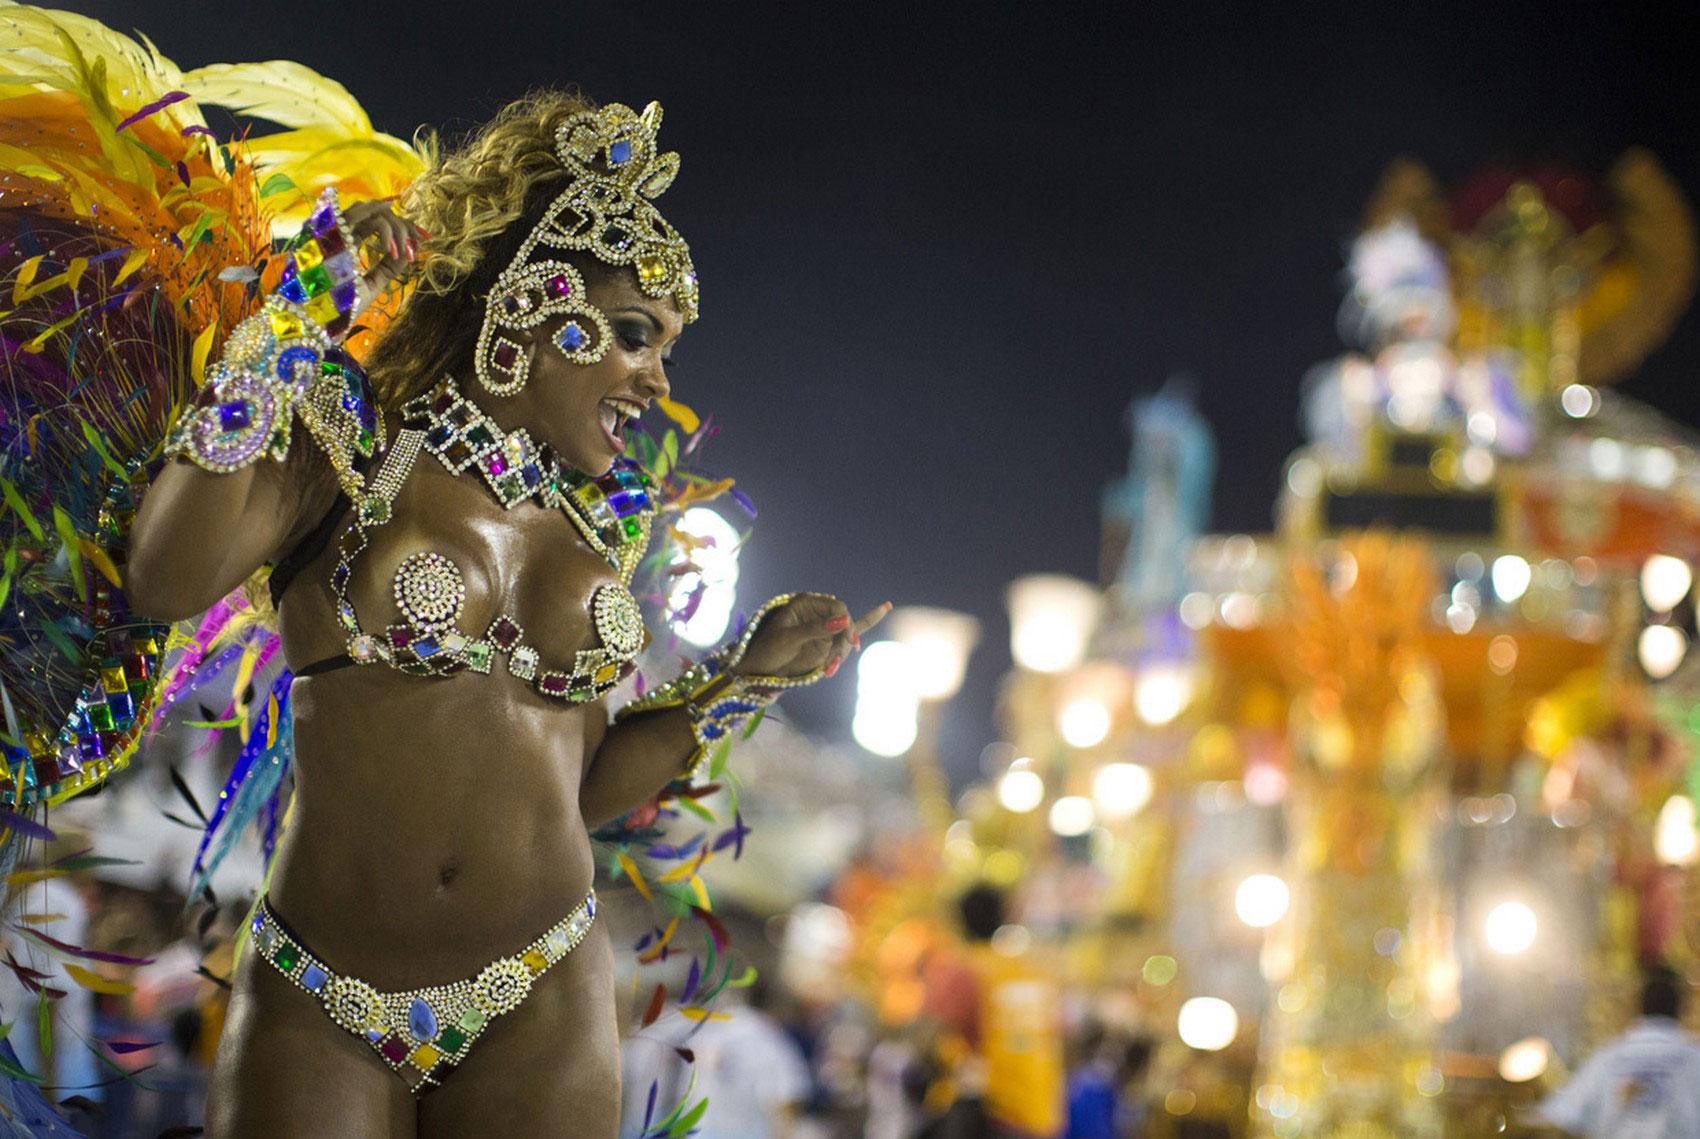 Исполнительница танца, фото Бразилии